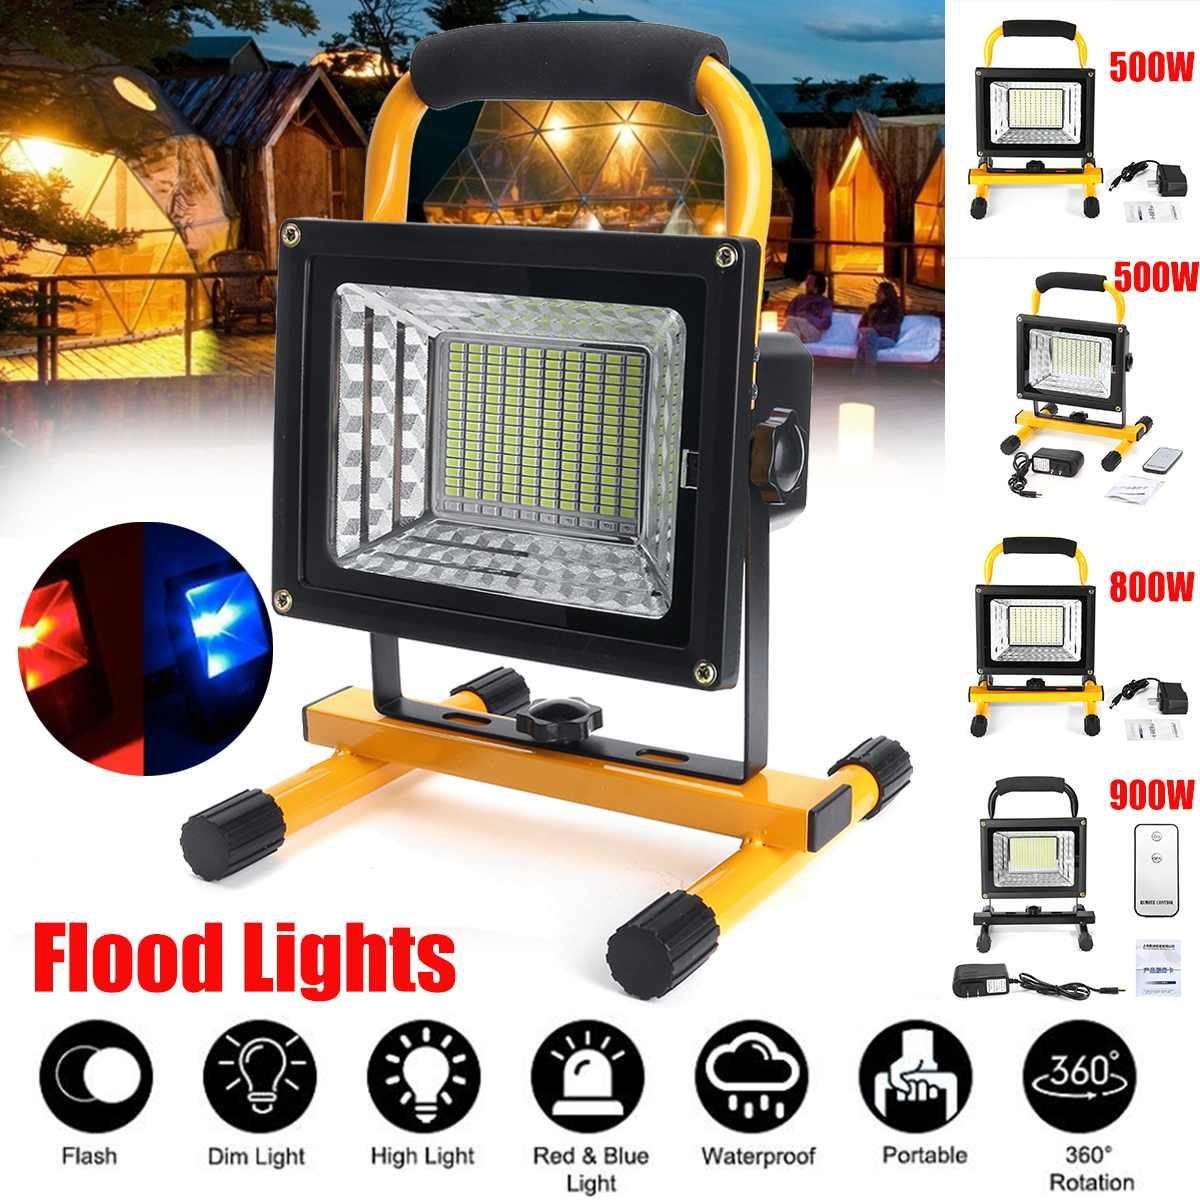 500/800 / 900W LED المحمولة القابلة لإعادة الشحن الكاشف أضواء ماء بطارية تعمل بالطاقة الكشاف في الهواء الطلق مصباح العمل التخييم